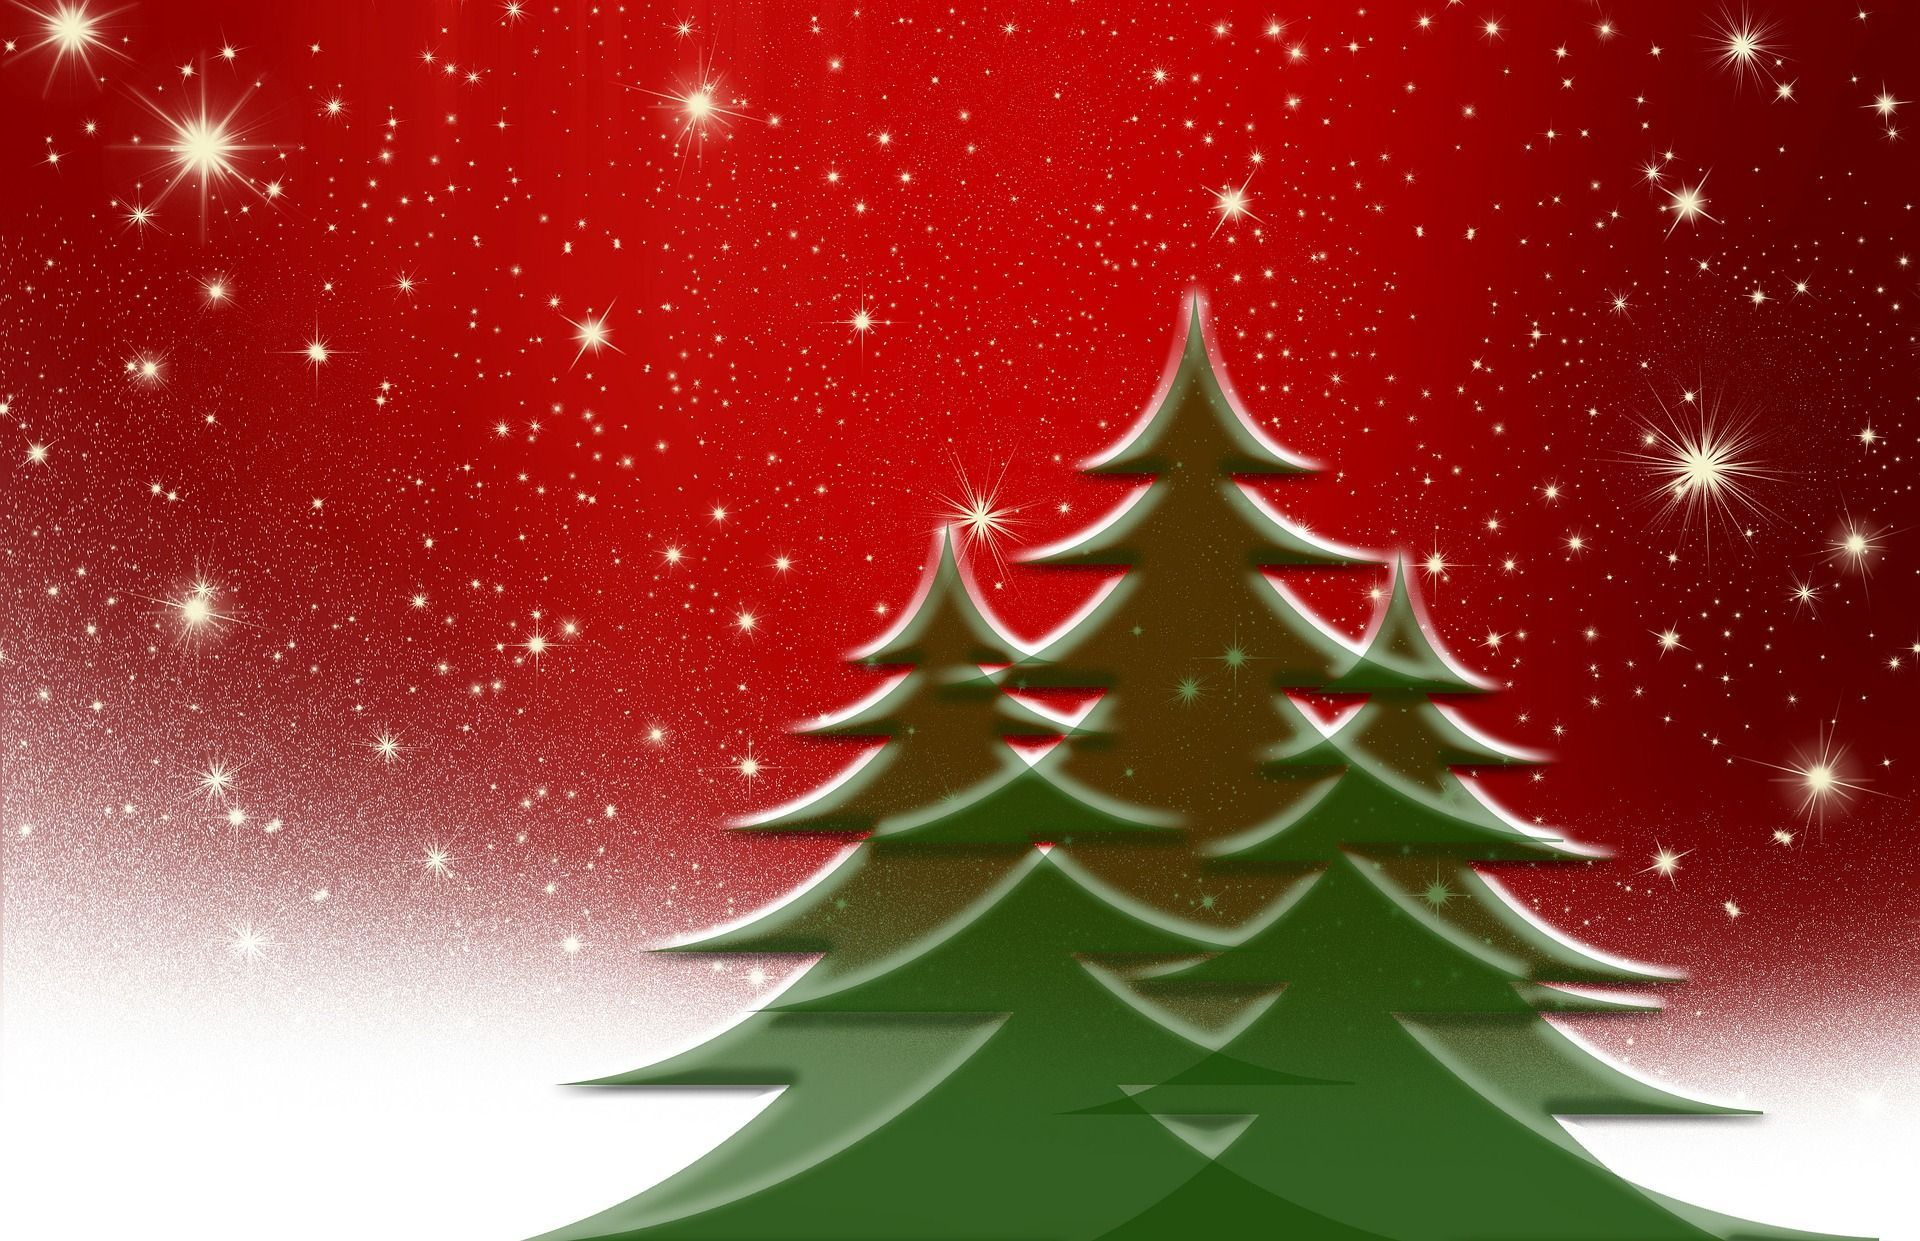 3e67e227b694d4055058_christmas-tree-66450_1920.jpg